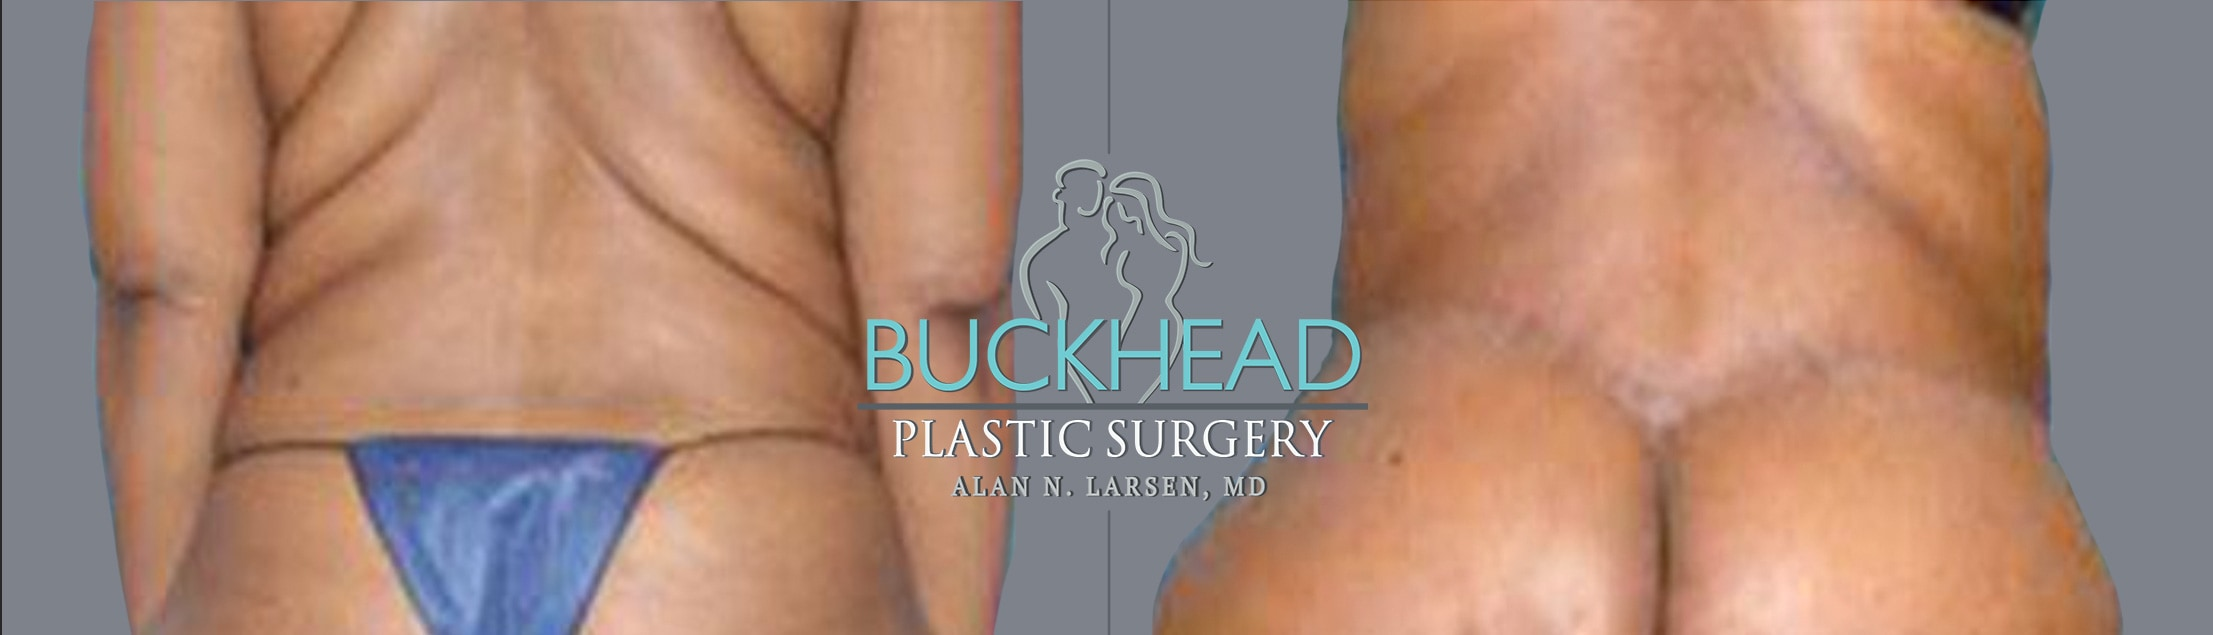 Before and After Photo Gallery | Upper Back Lift | Buckhead Plastic Surgery | Alan N. Larsen, MD | Board-Certified Plastic Surgeon | Atlanta GA